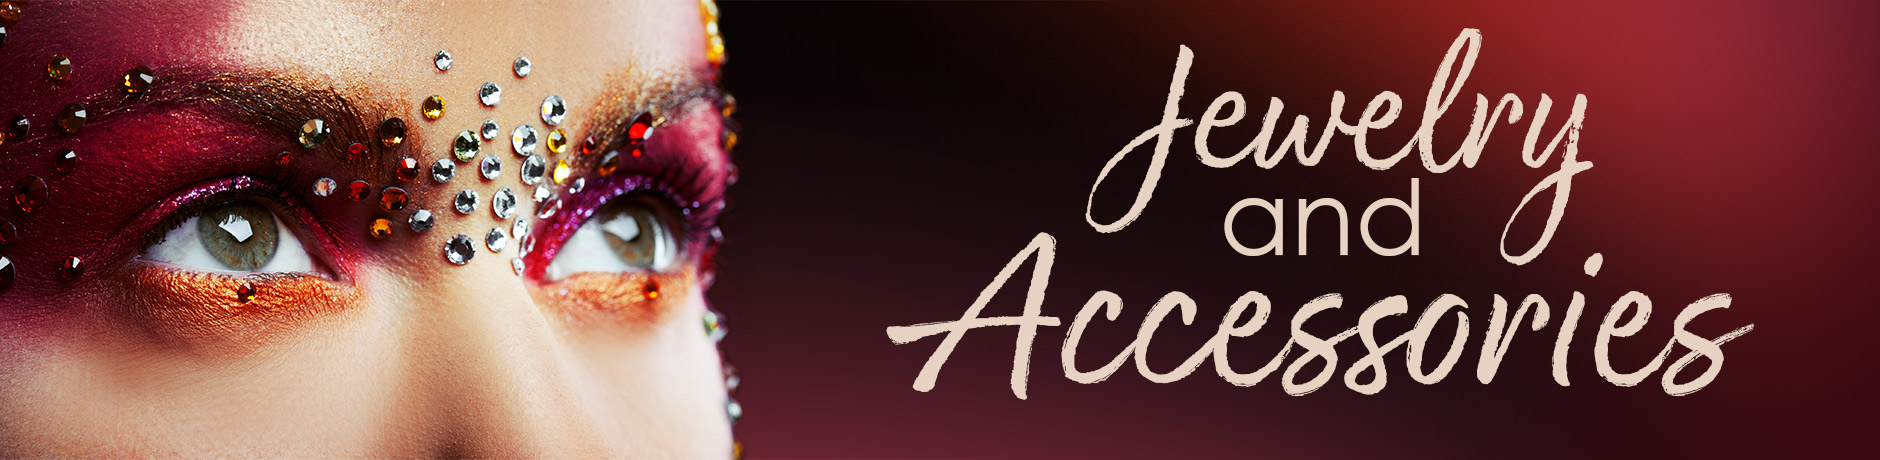 Costume Jewelry & Accessories